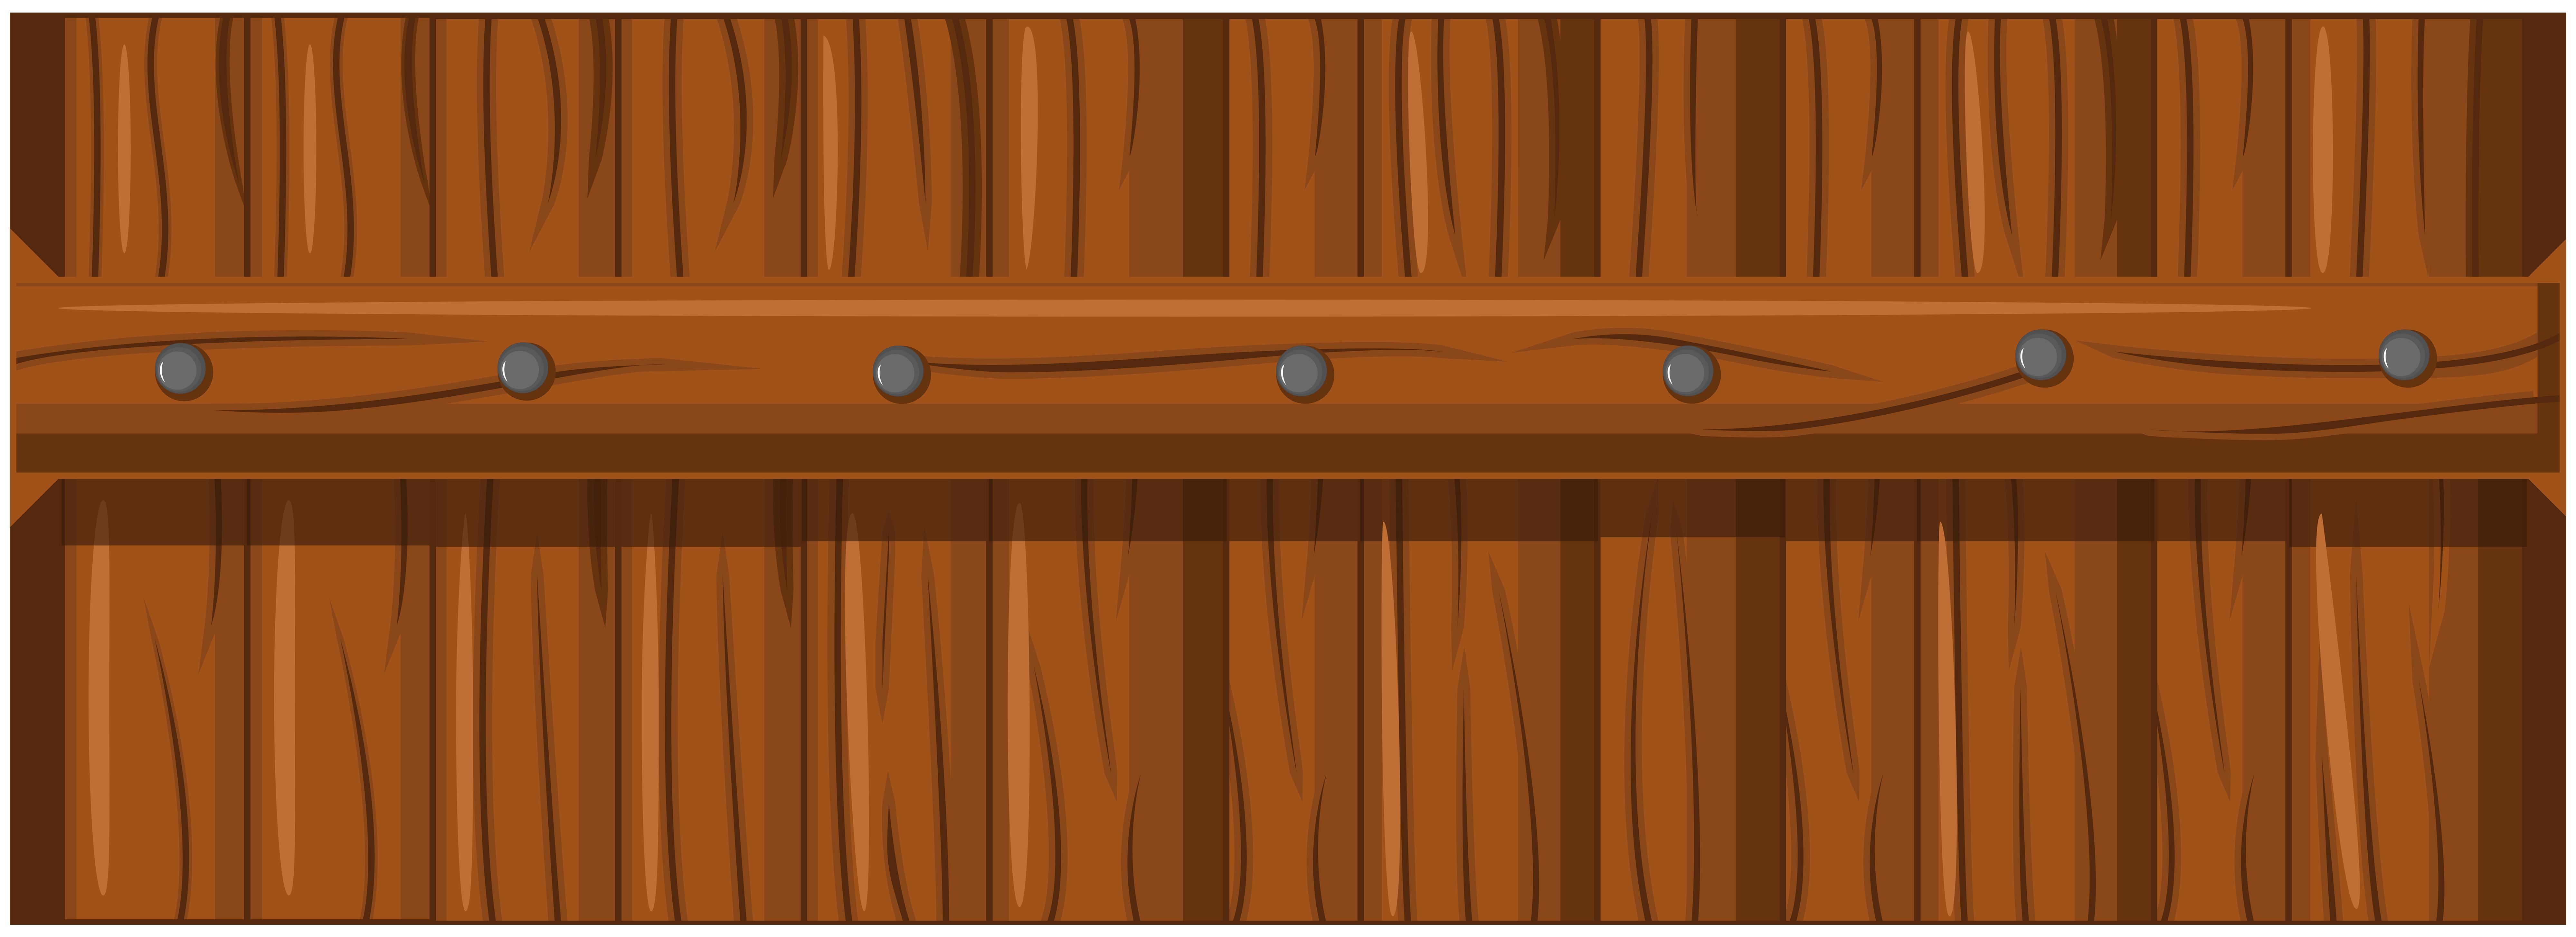 Brown Wooden Fence Transparent PNG Clip Art.